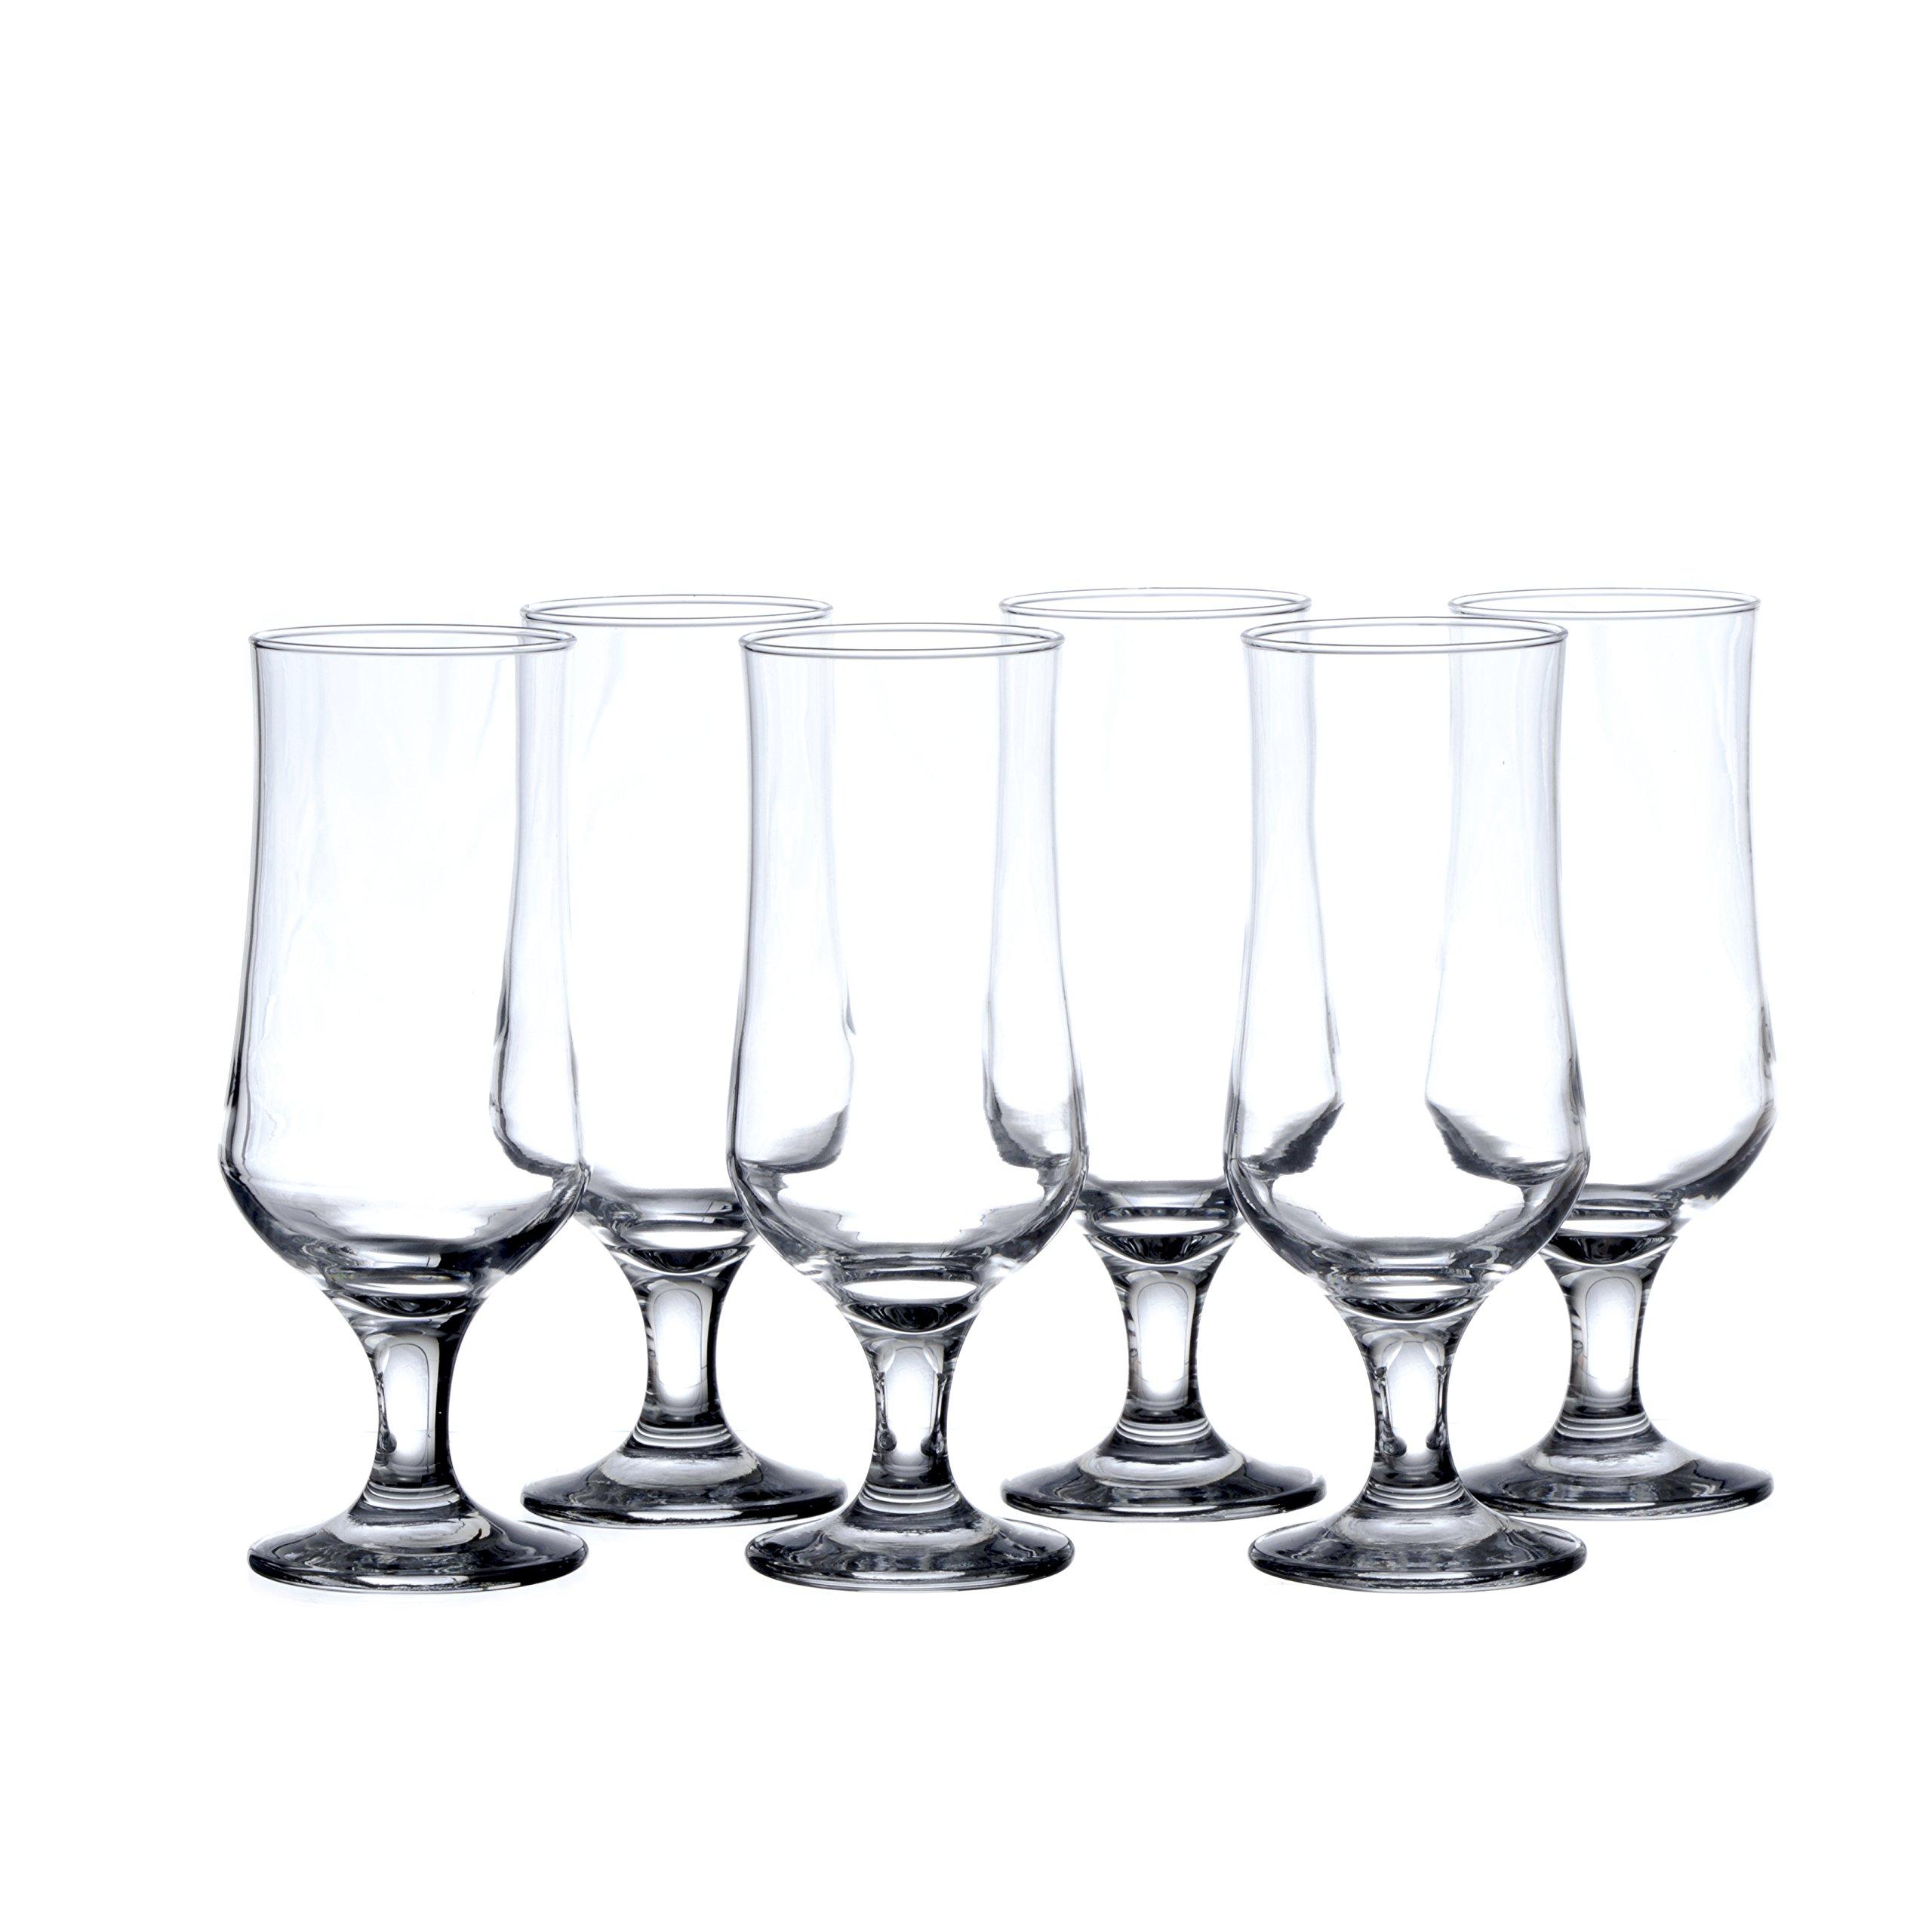 PASABACHE Hurricane Cocktail Glasses, 13-Ounce (6-piece, 12-piece set) (12) by Pasabache